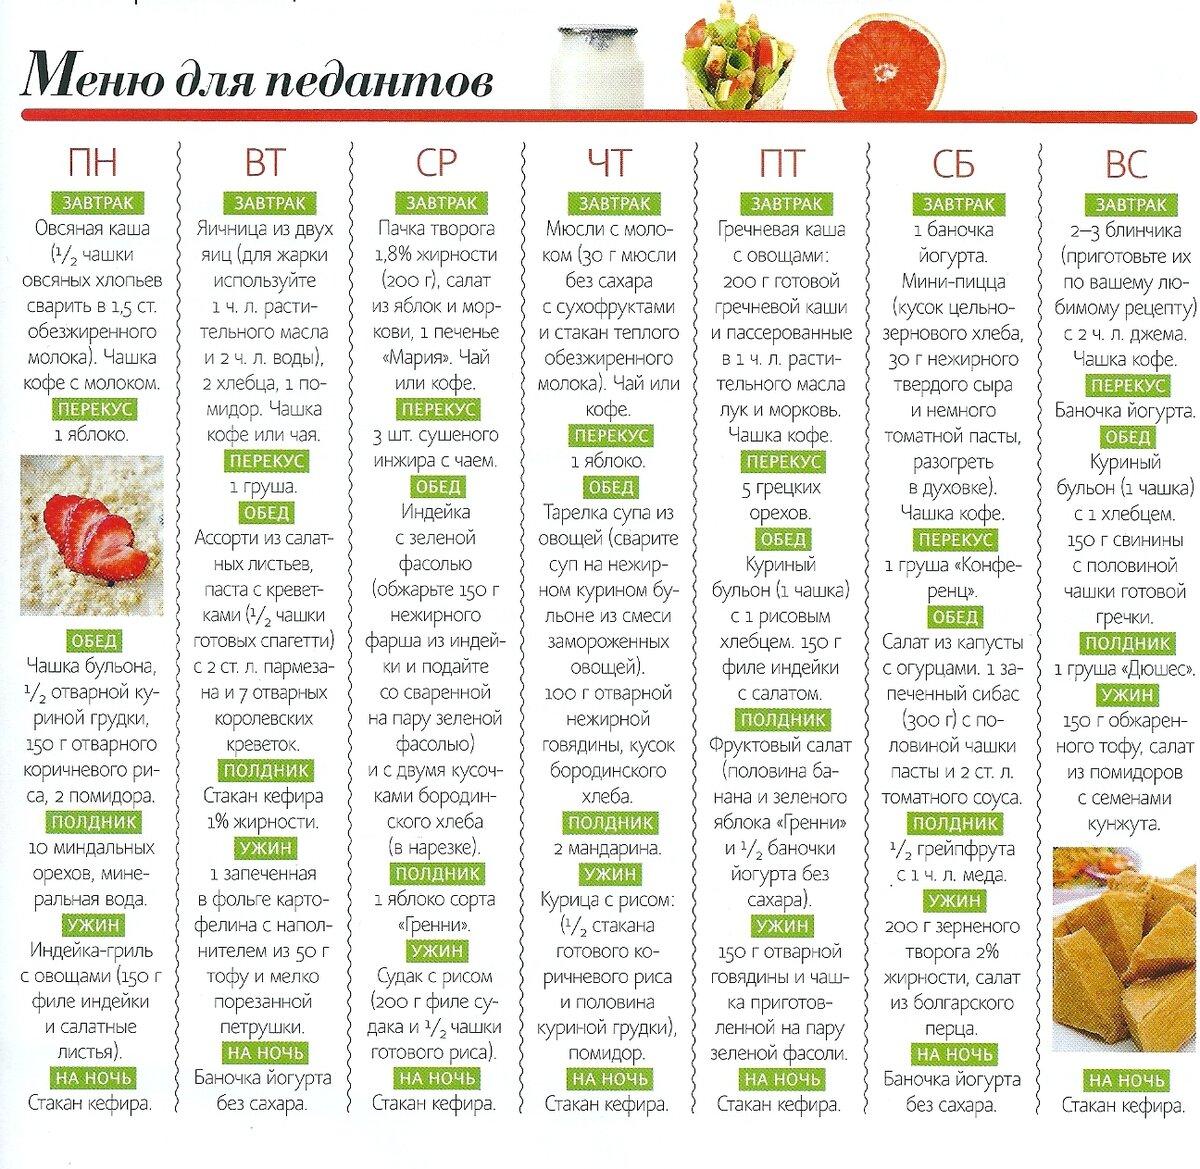 Хочу похудеть меню на месяц